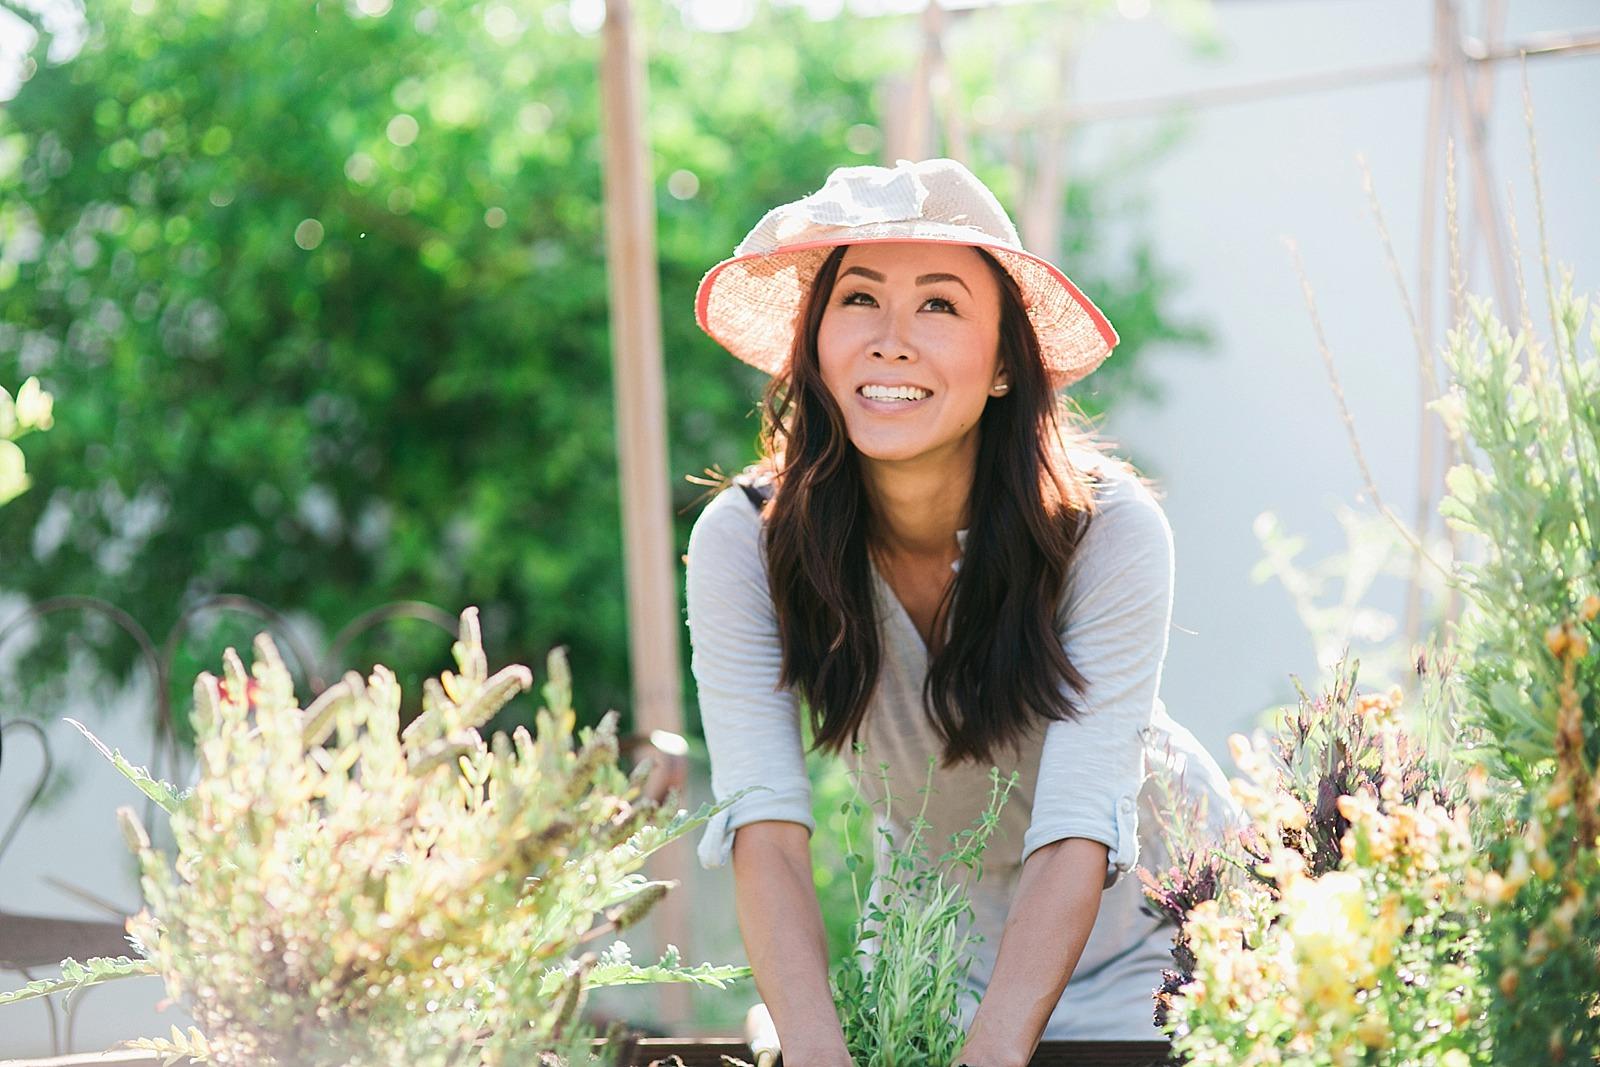 milo-iced-tea-gardening-lifestyle-blogger-diana-elizabeth-blog_0060